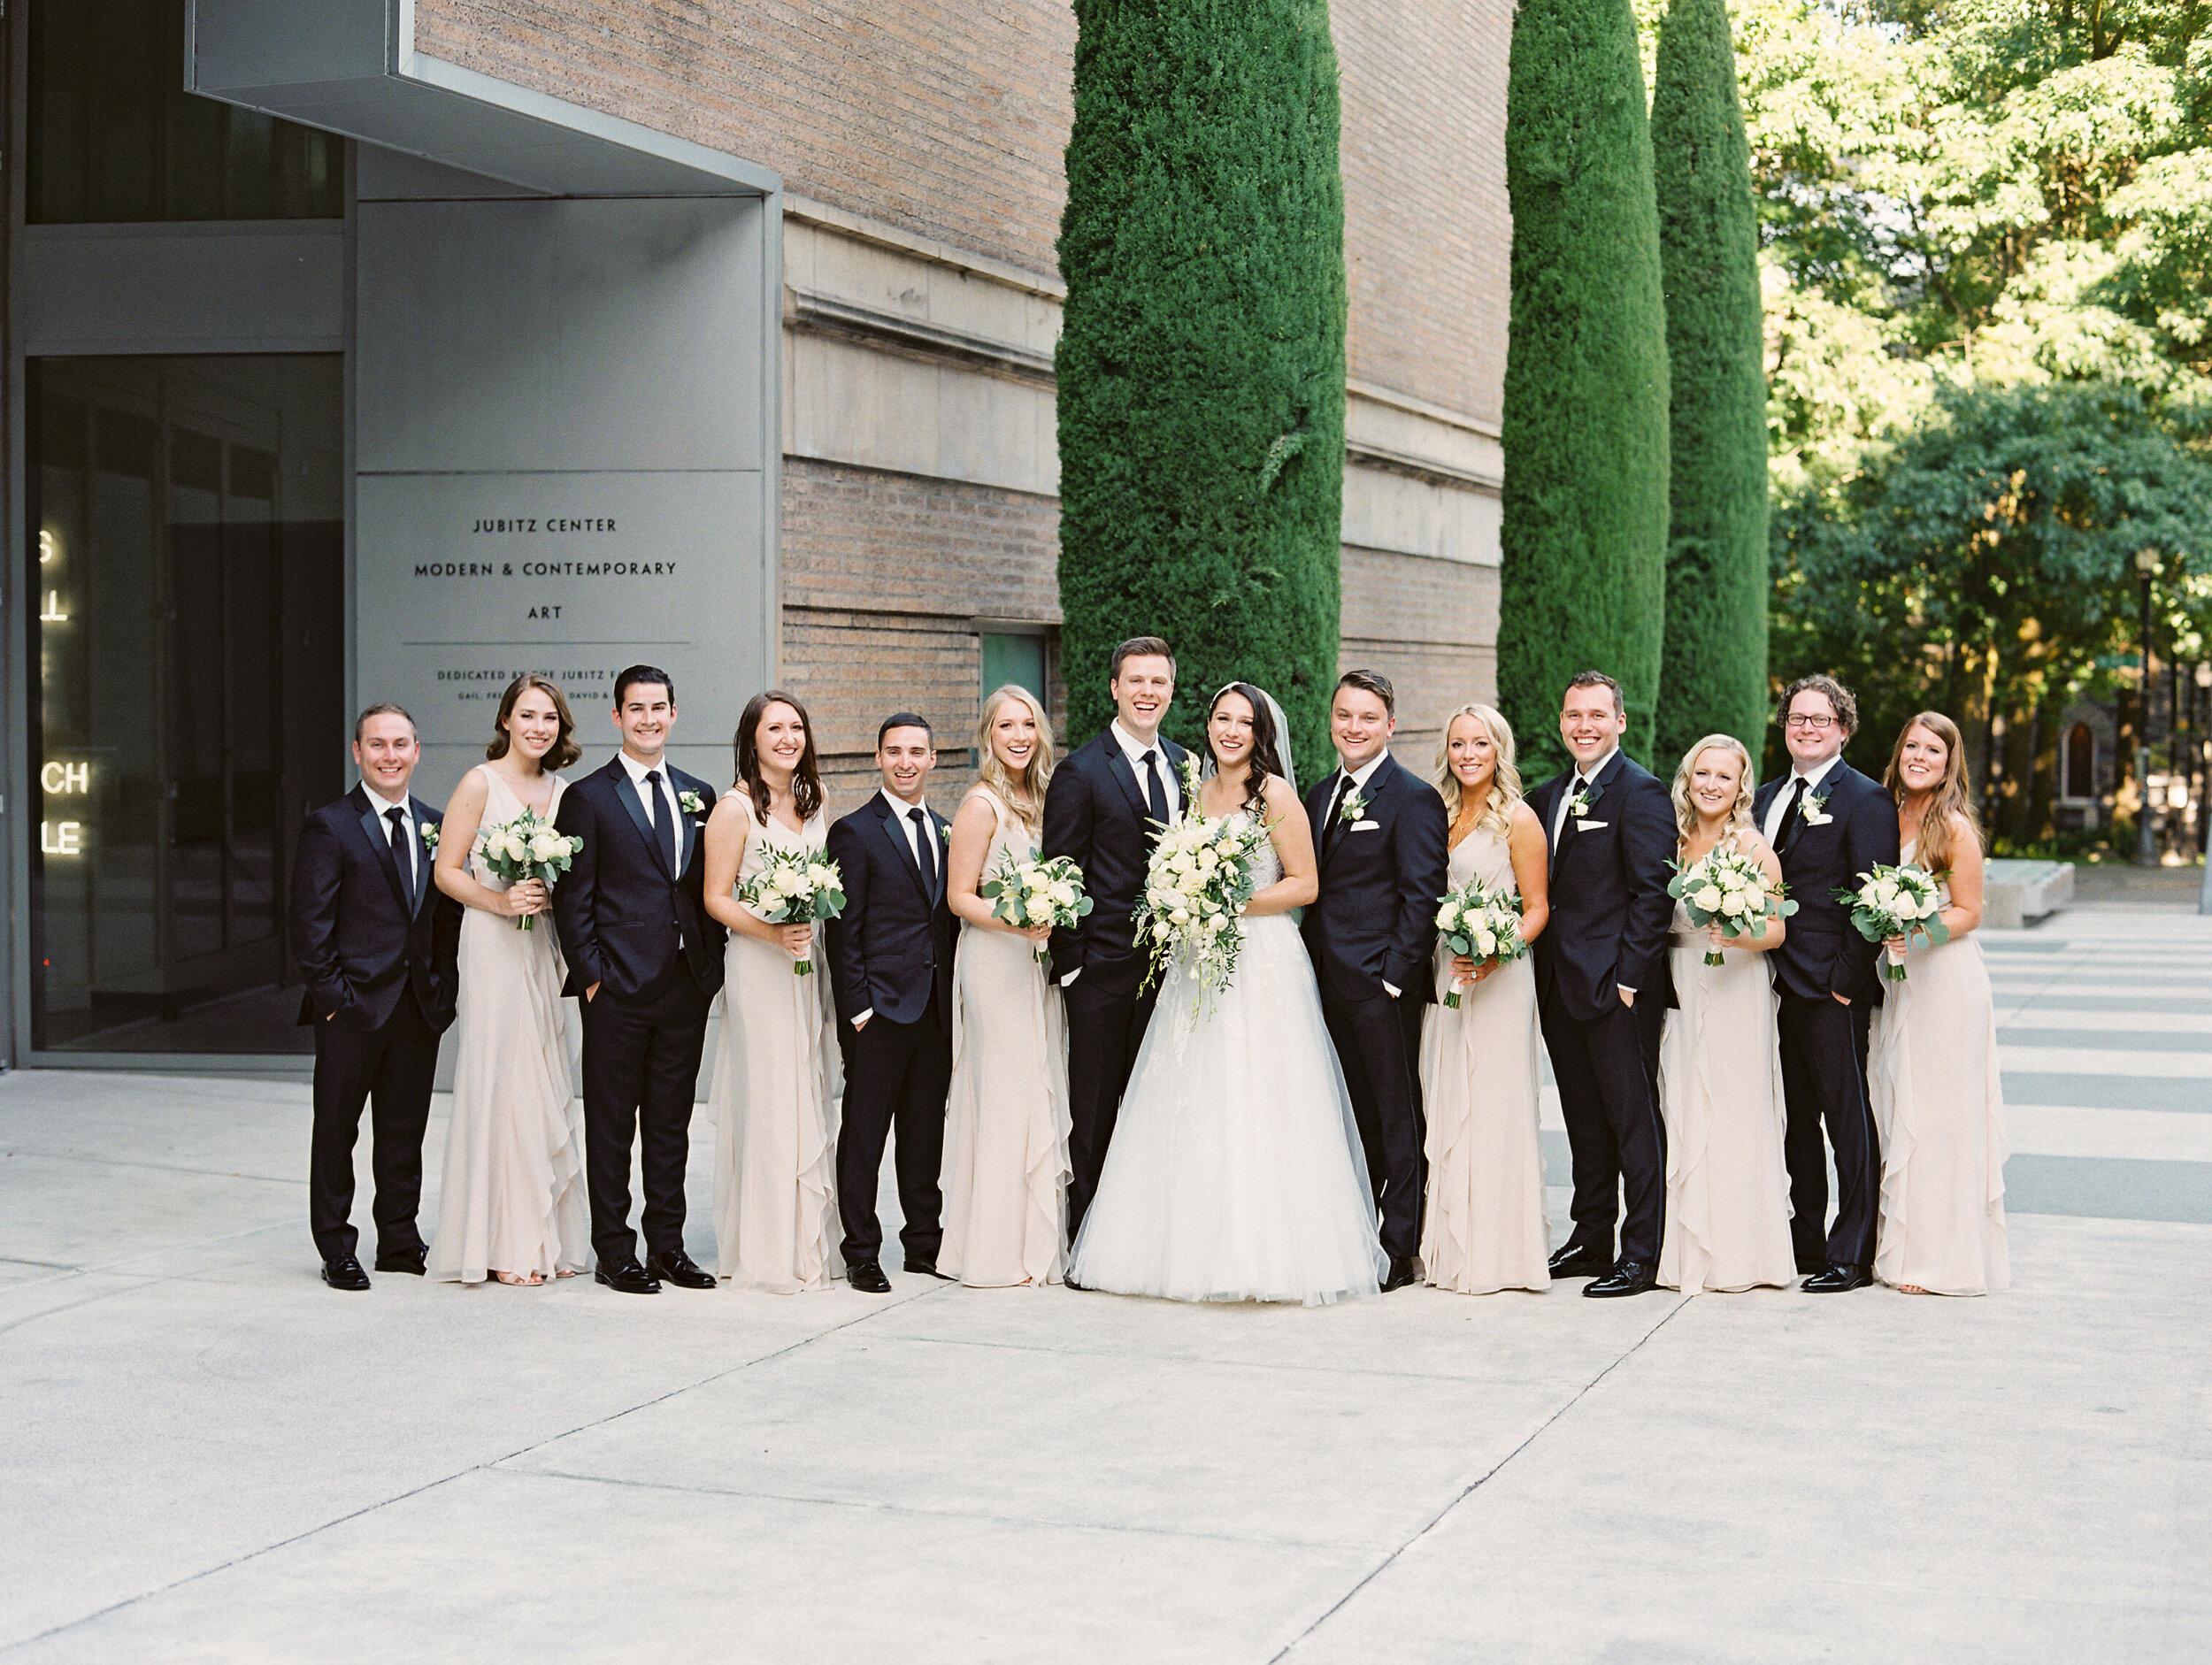 Becker - Schwer Wedding